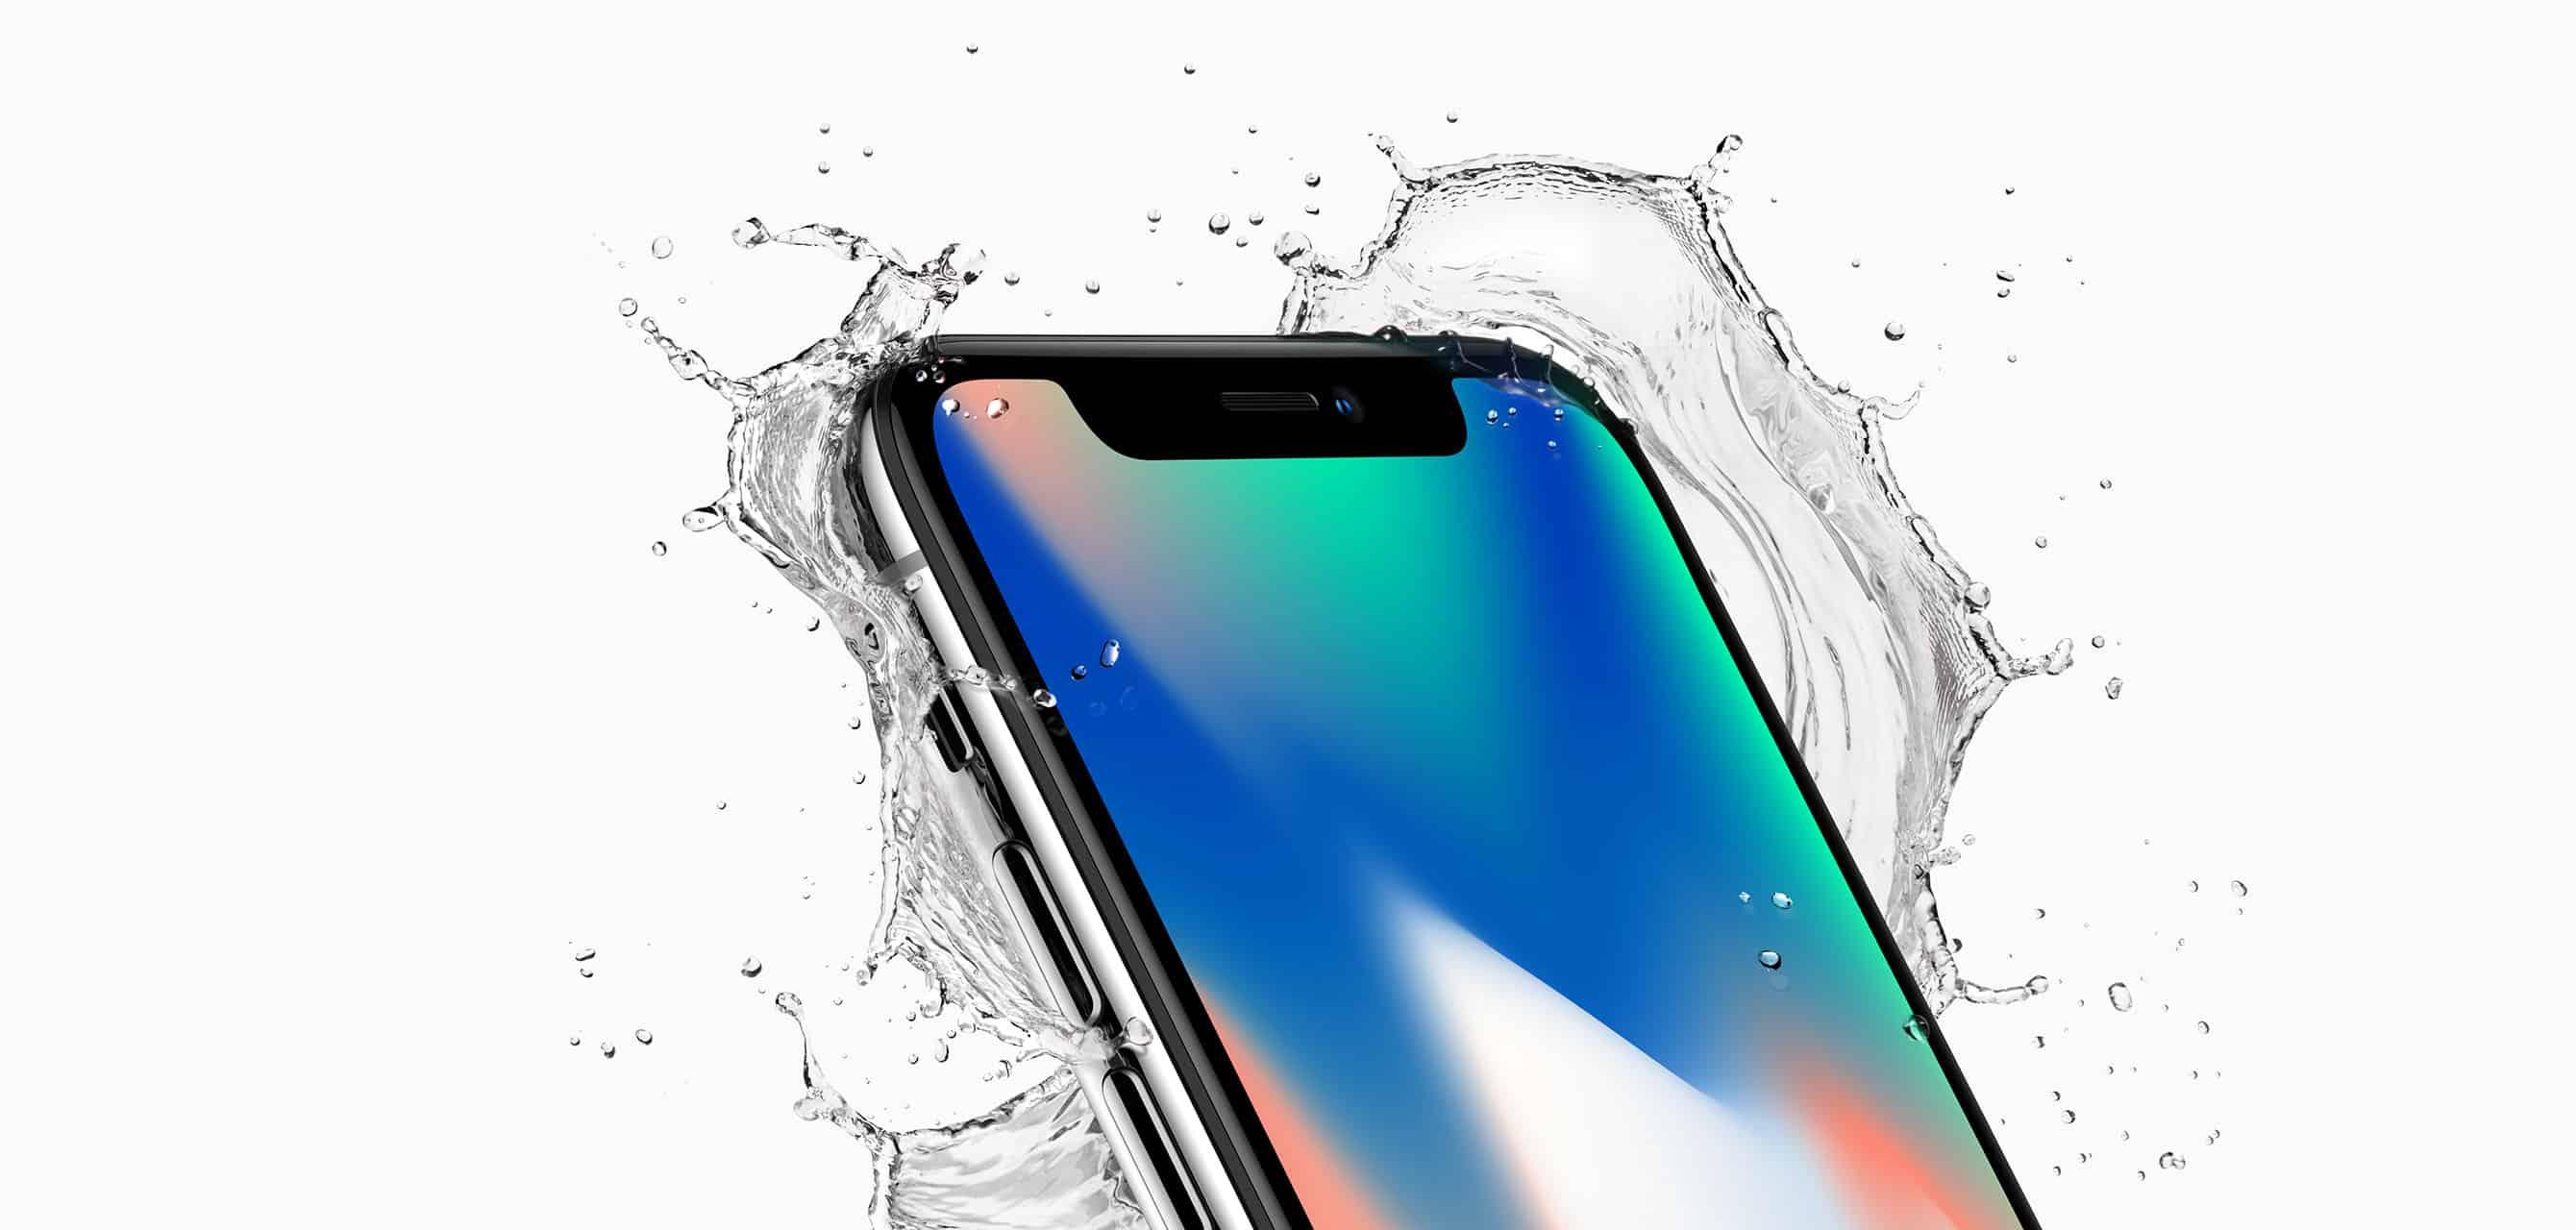 iphone x wodoodporny